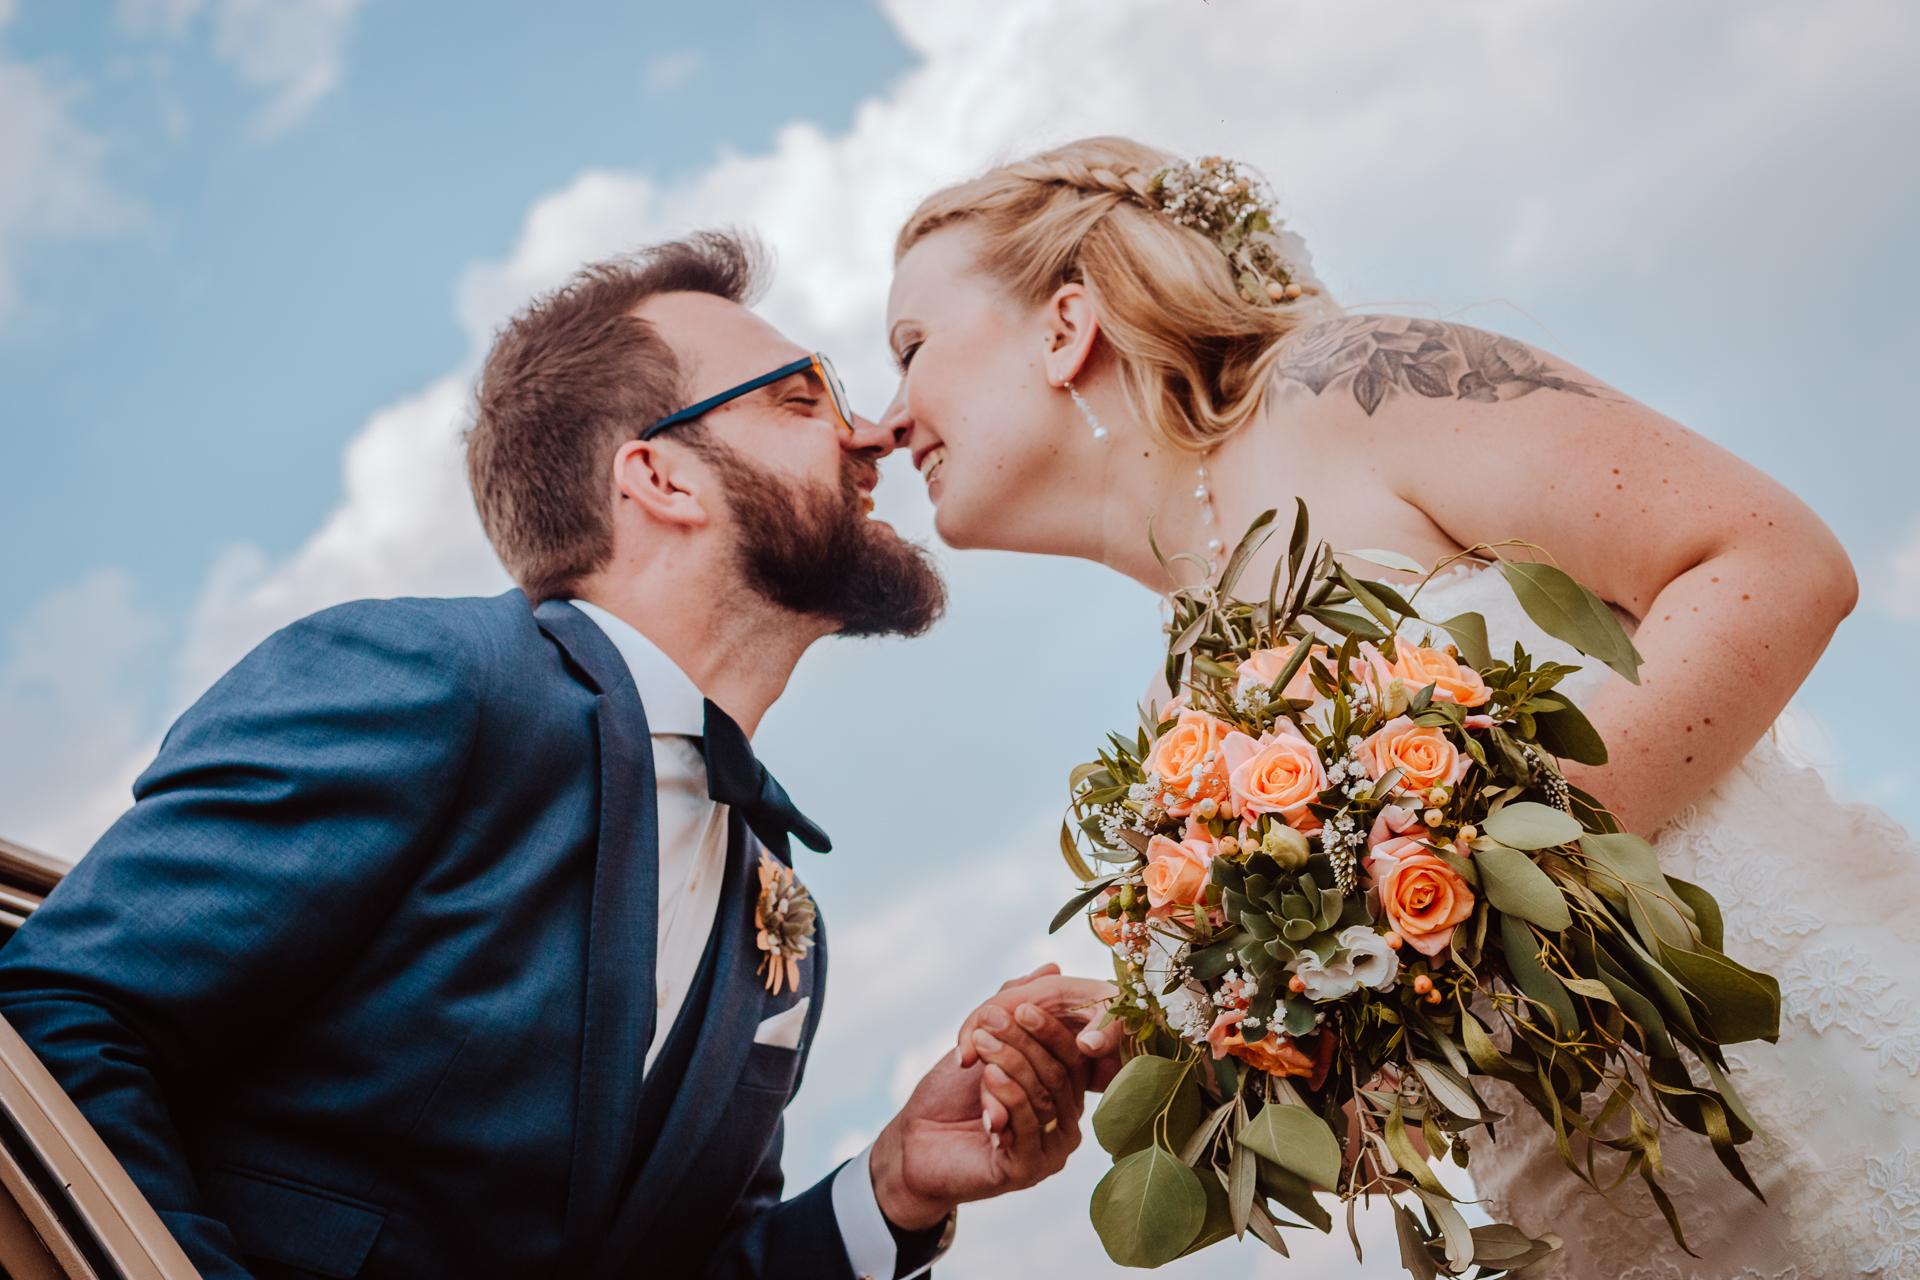 lisaundjonny_website_jasminjohanna_72dpi_100pz_1920-Lisa&Jonny — Coupleshooting1 –AdobeRGB — 200dpi — 005